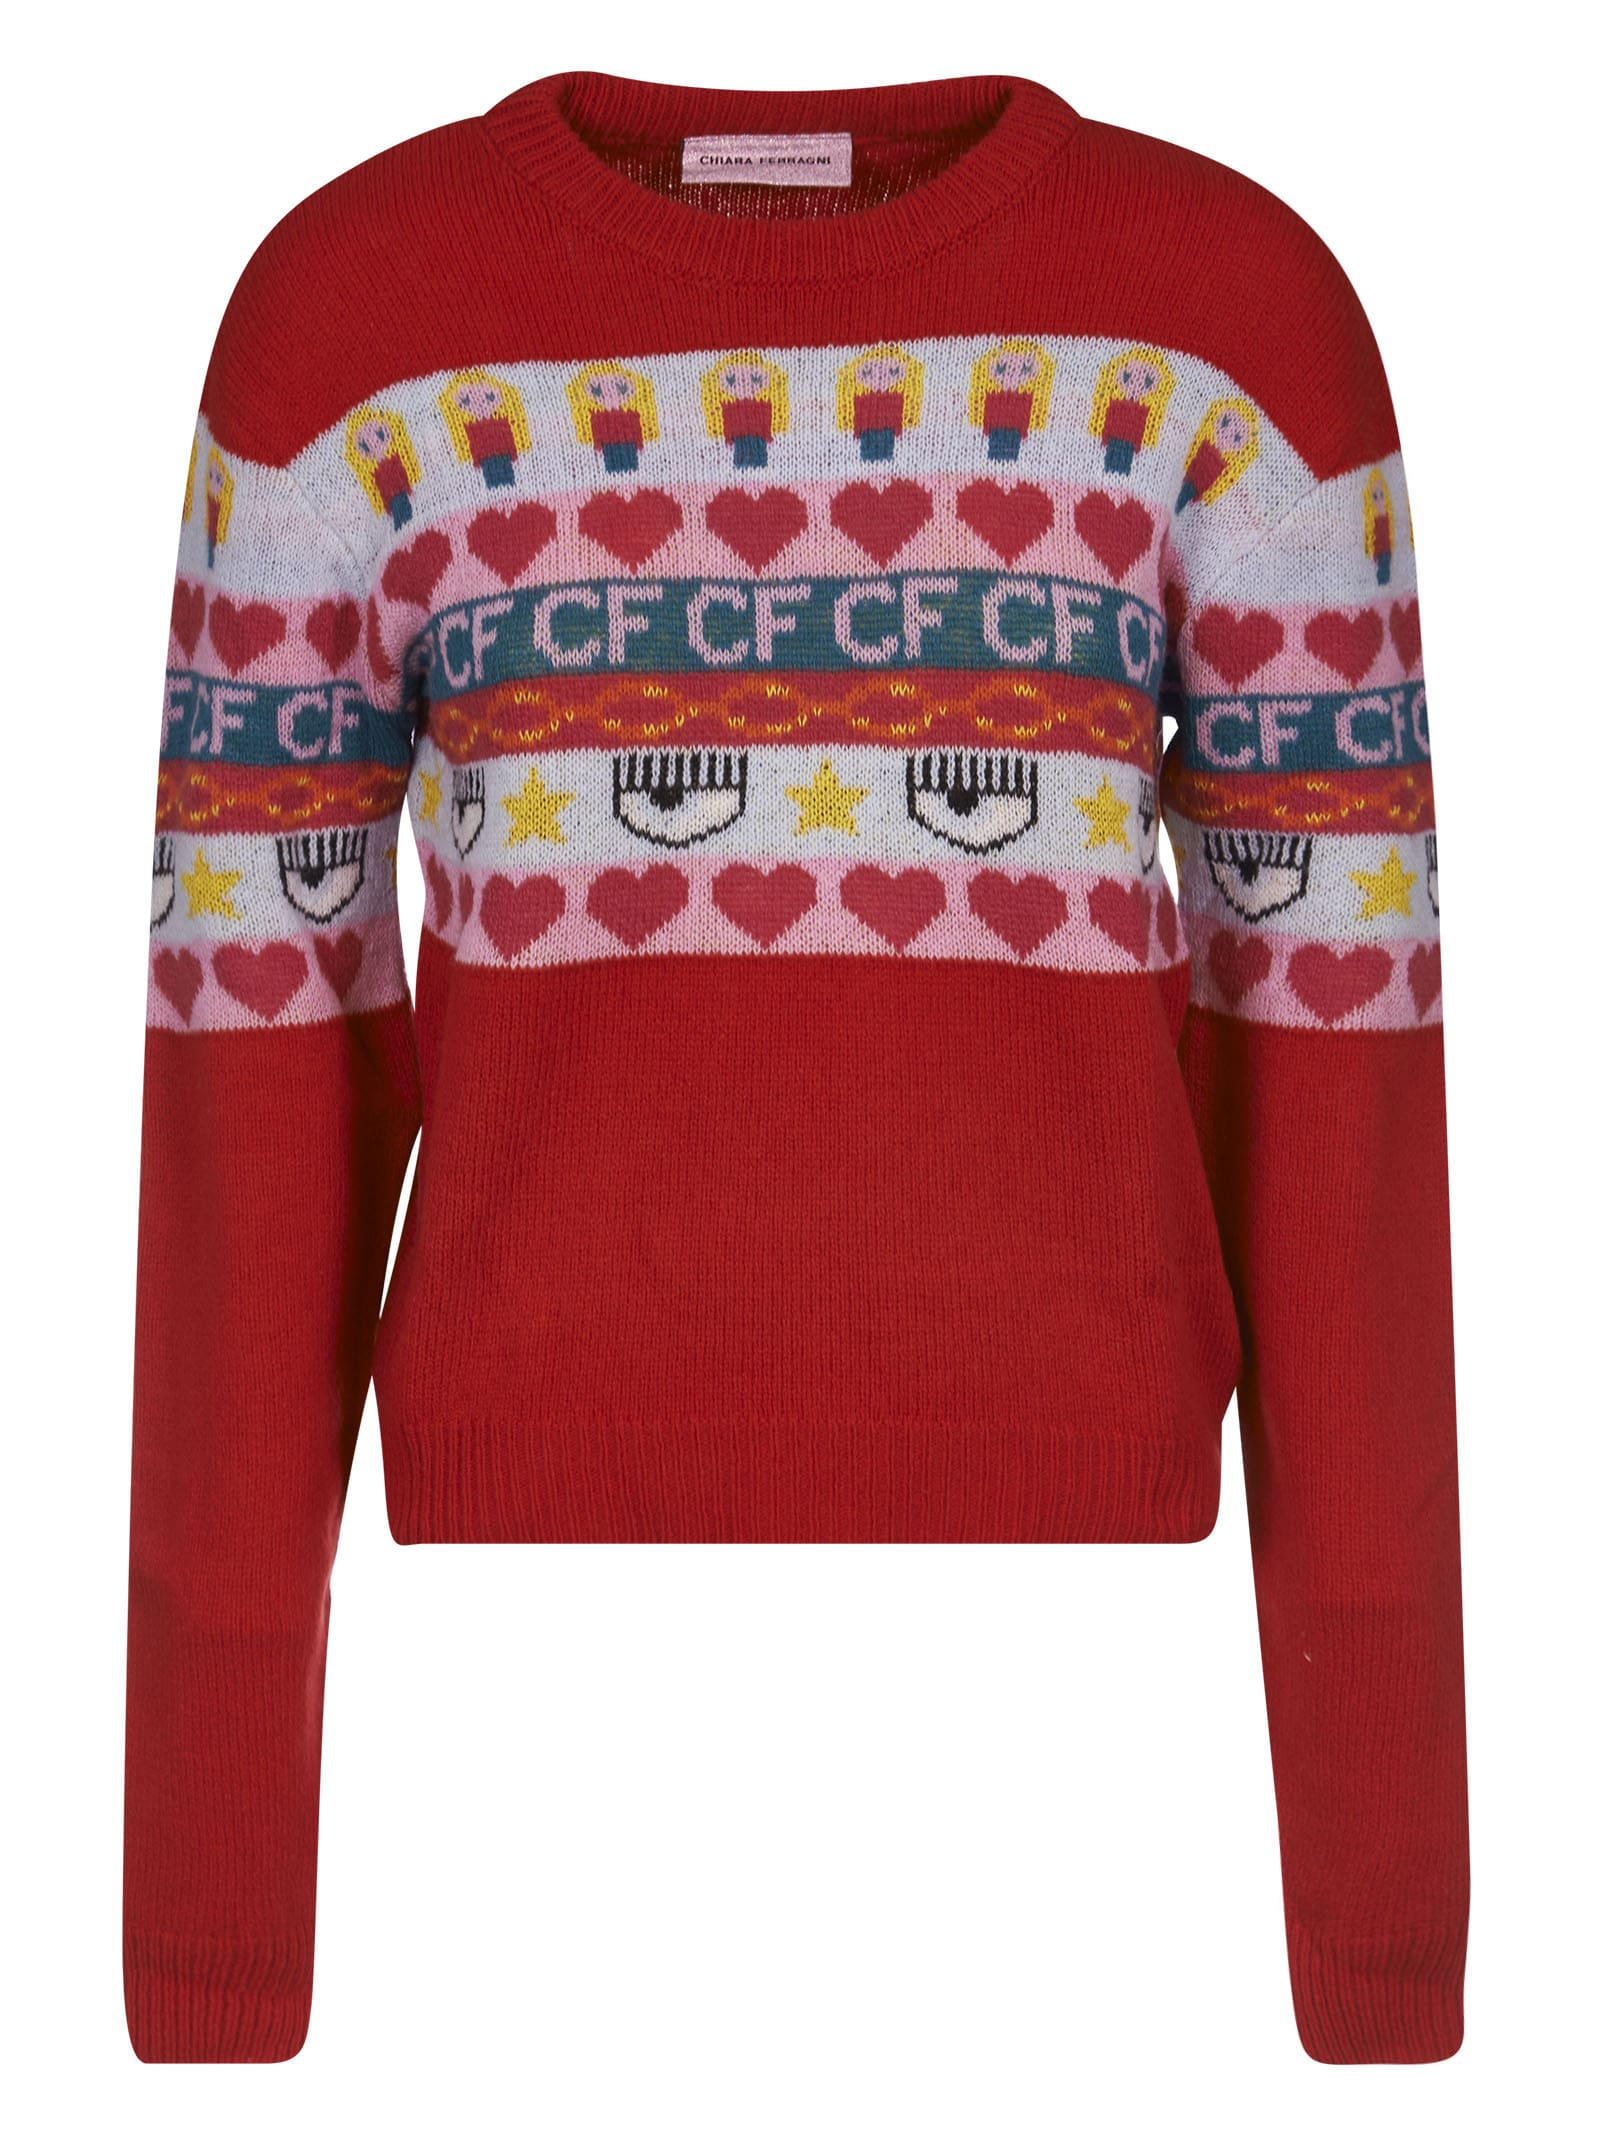 Chiara Ferragni Norwegian Crewneck Knit Sweater